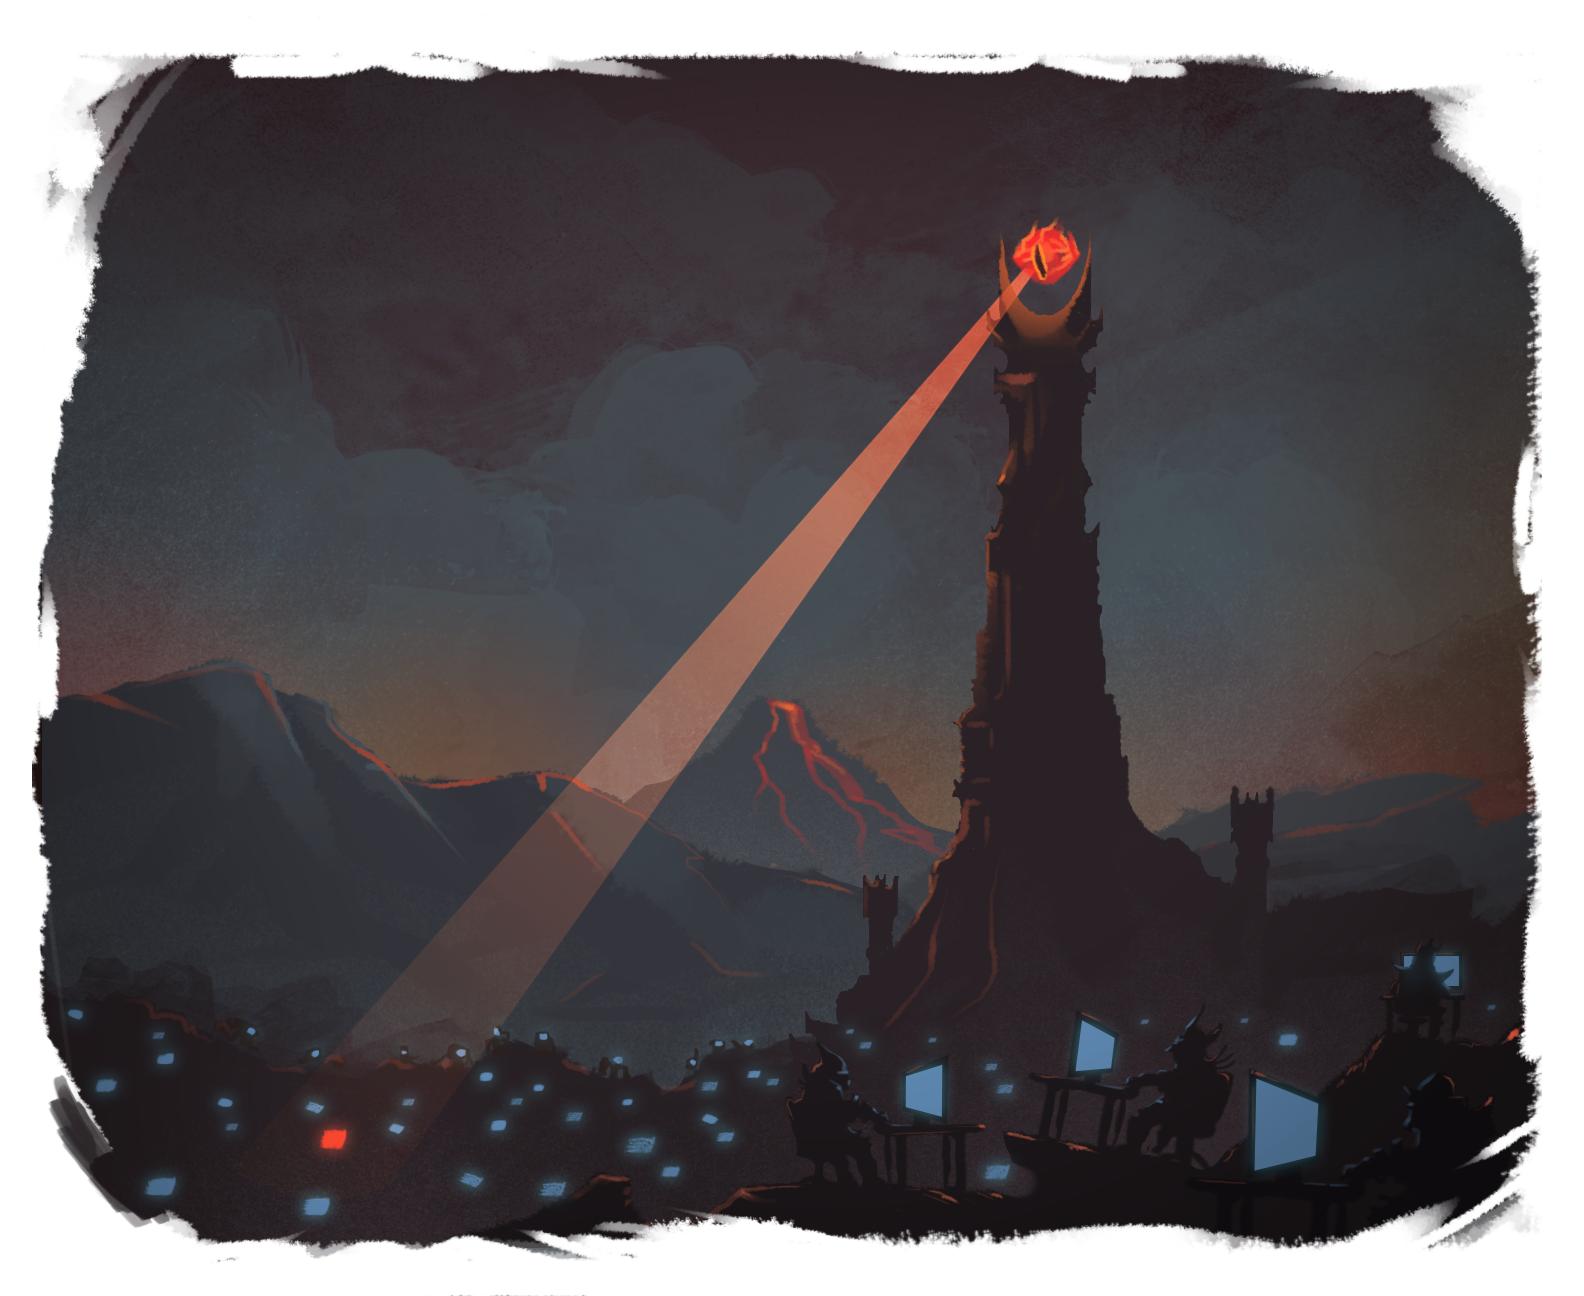 eye of sauron (1)